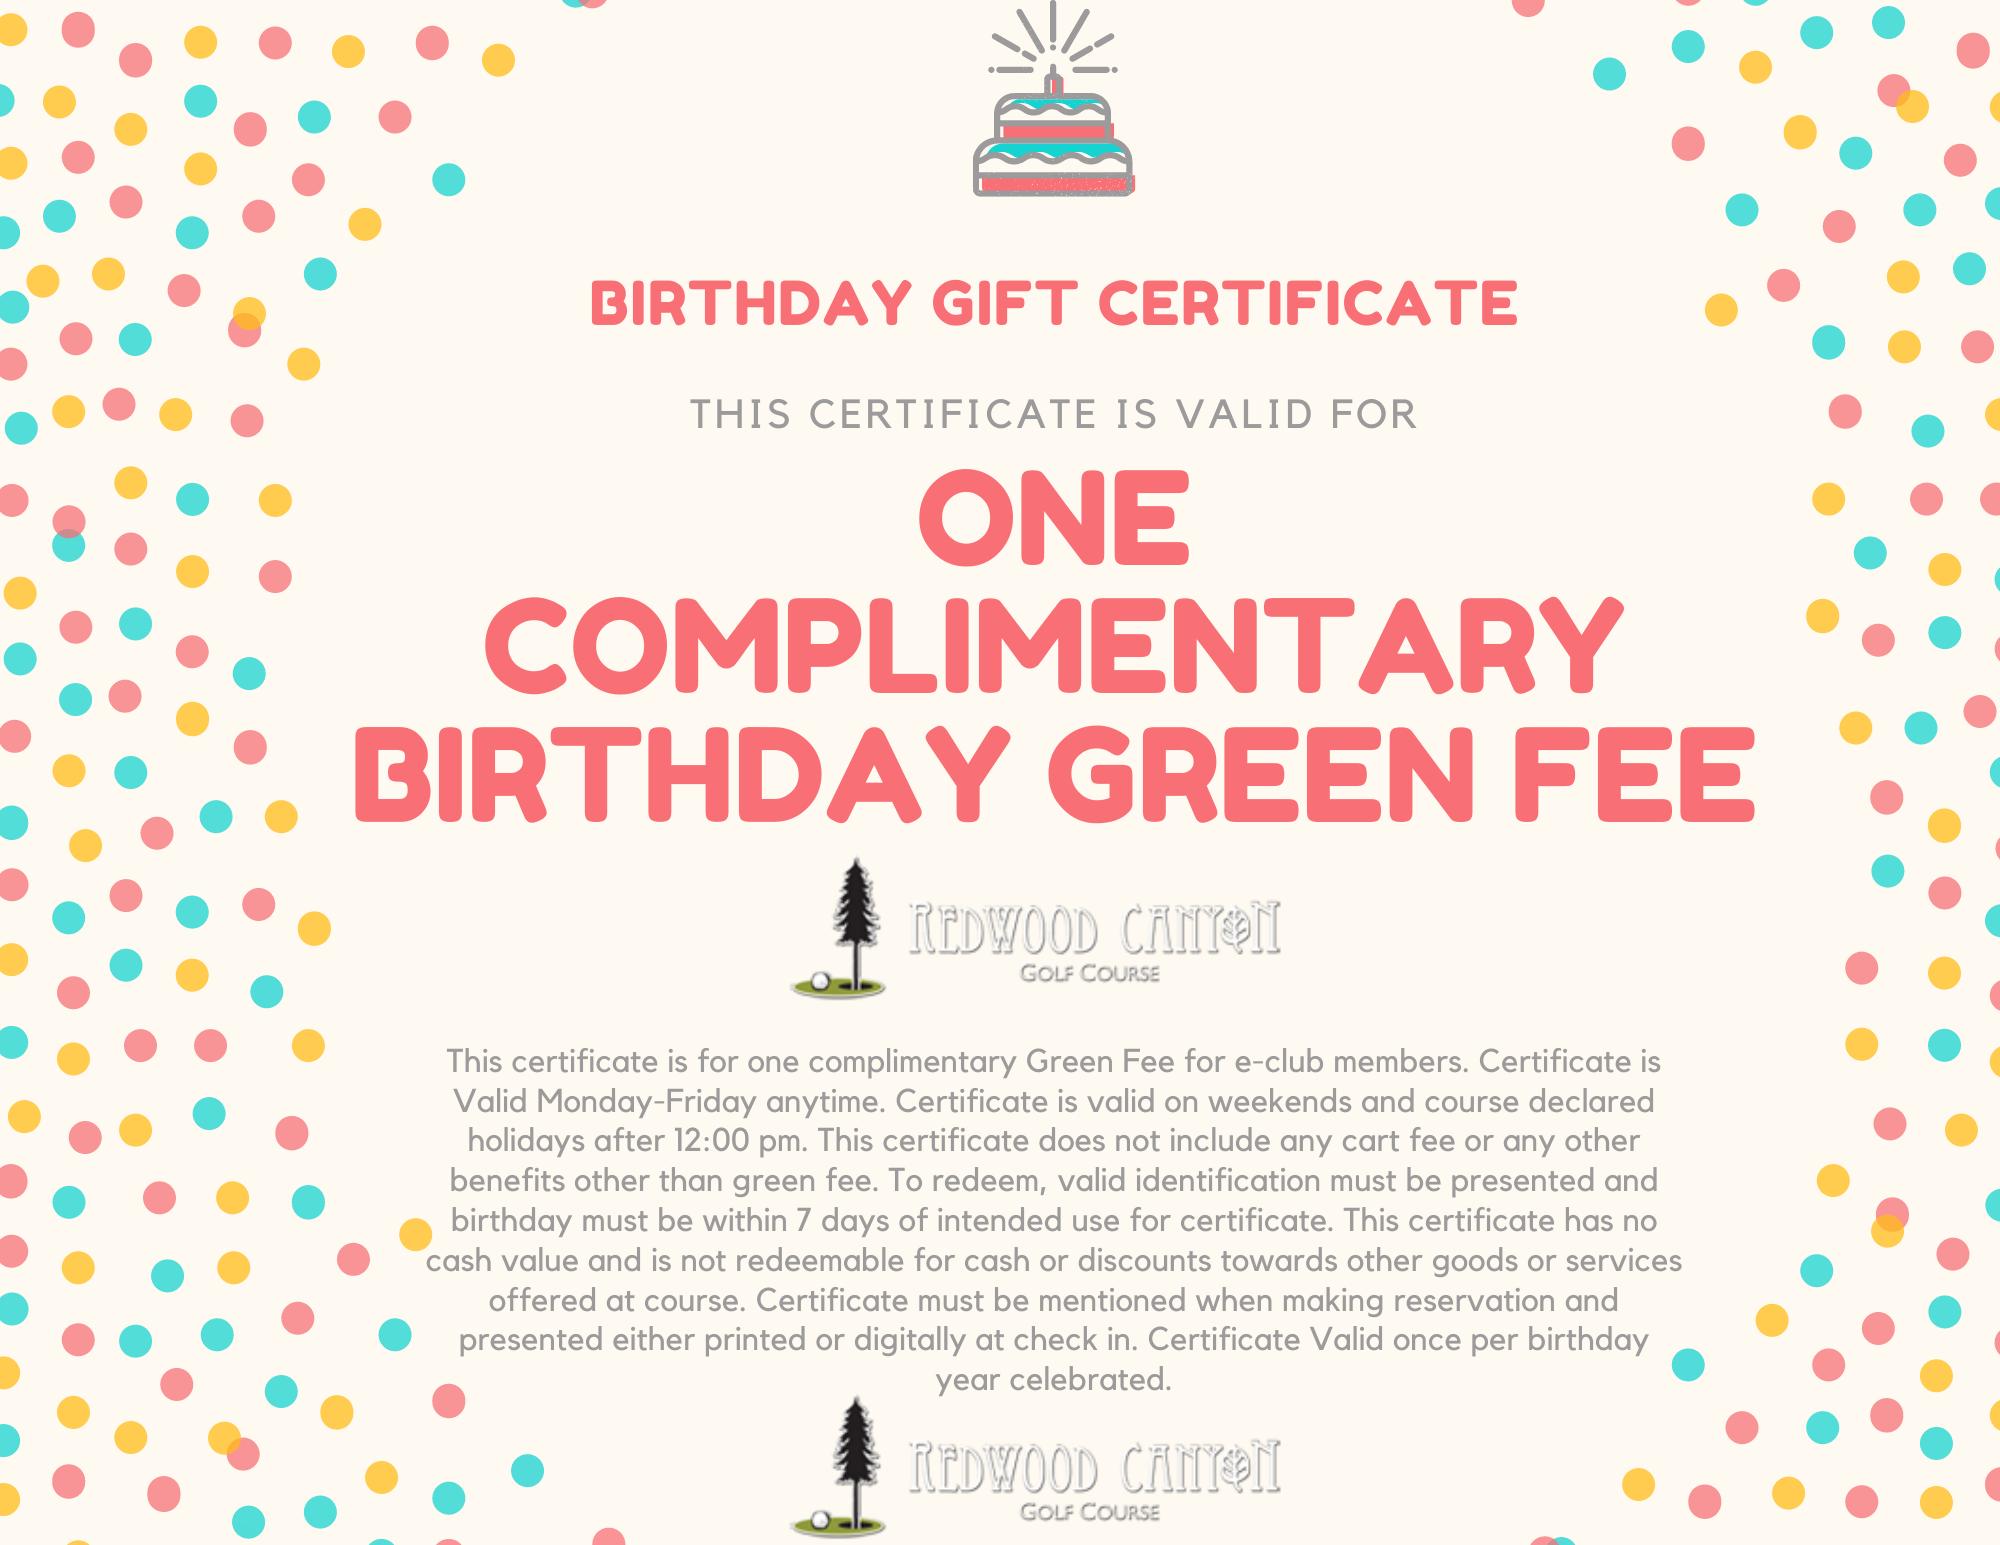 birthday green fee